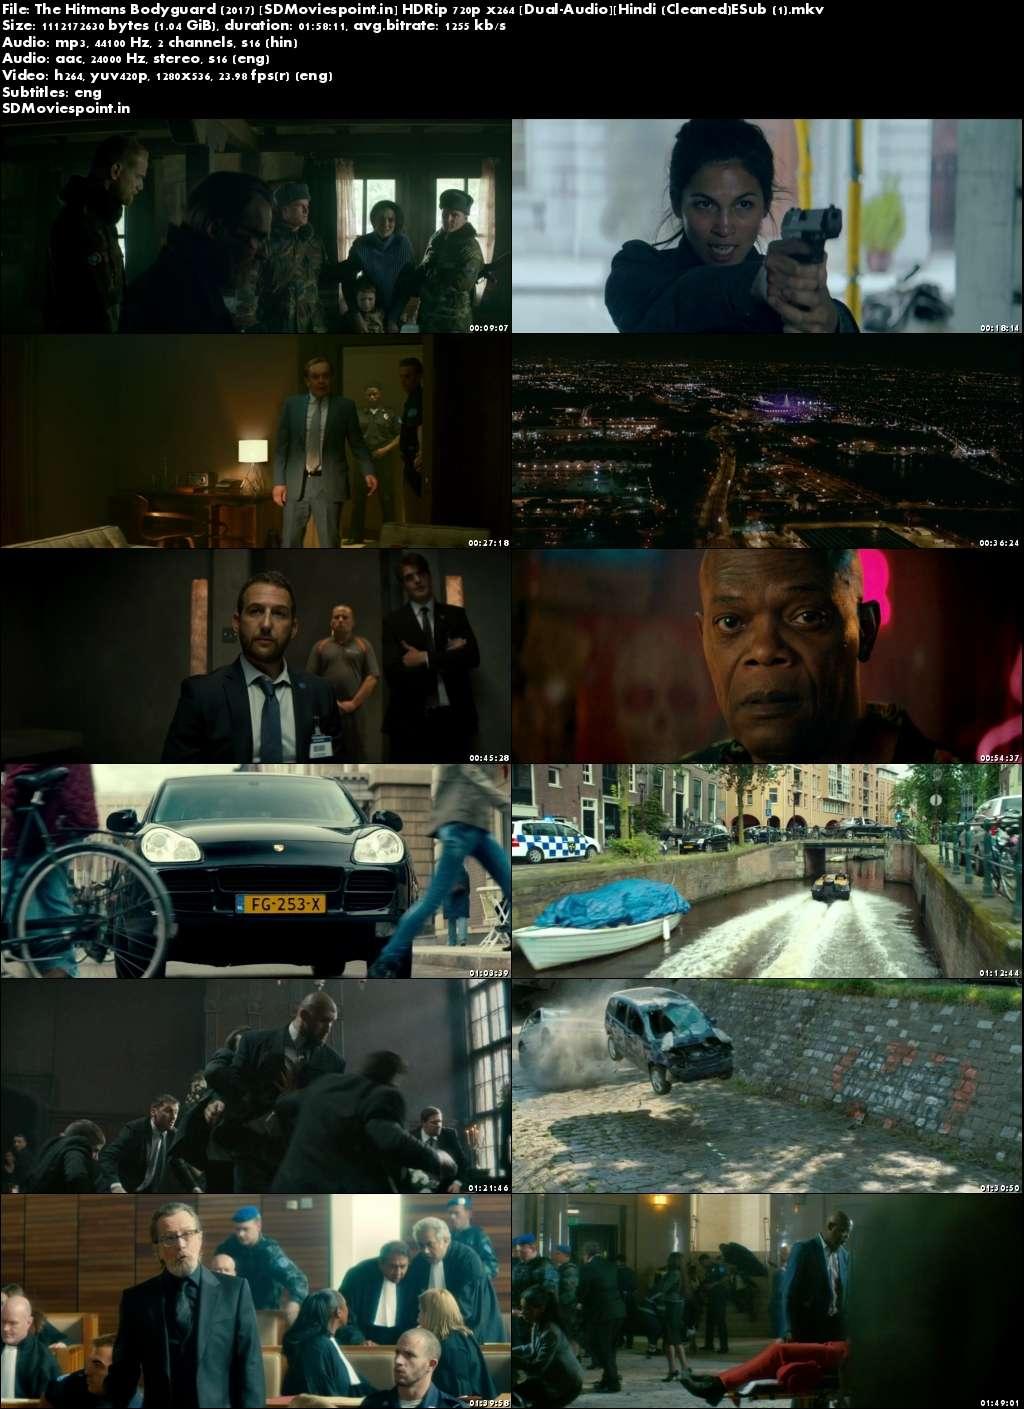 Screen Shots The Hitman's Bodyguard (2017) Full HD Movie Dual Audio In Hindi 720p